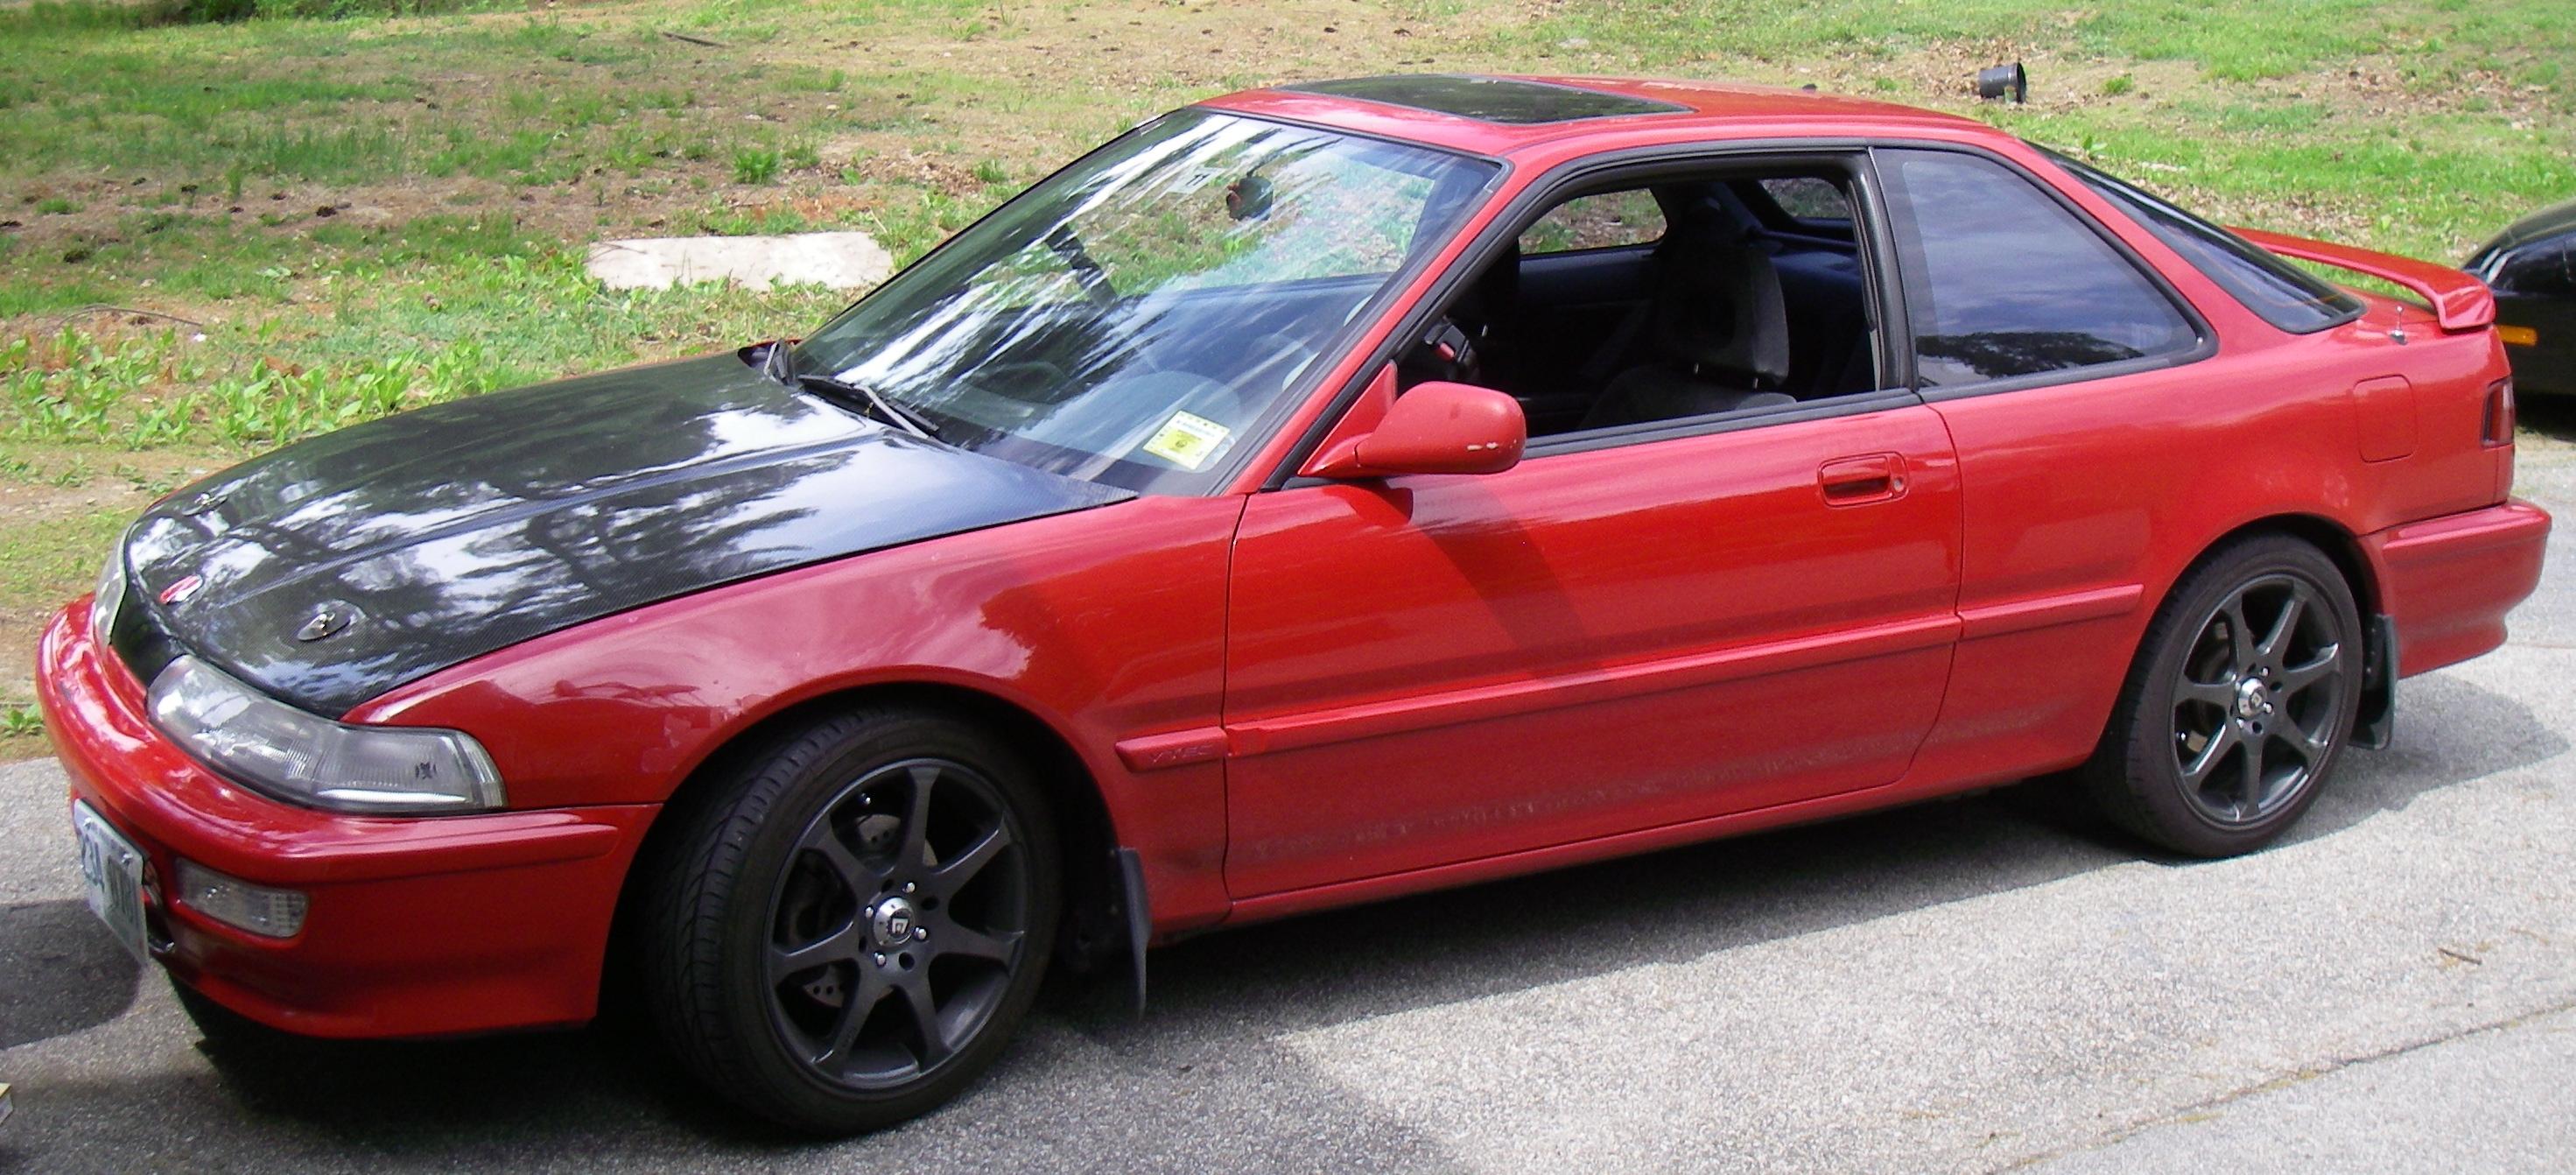 1992 Acura Integra 6